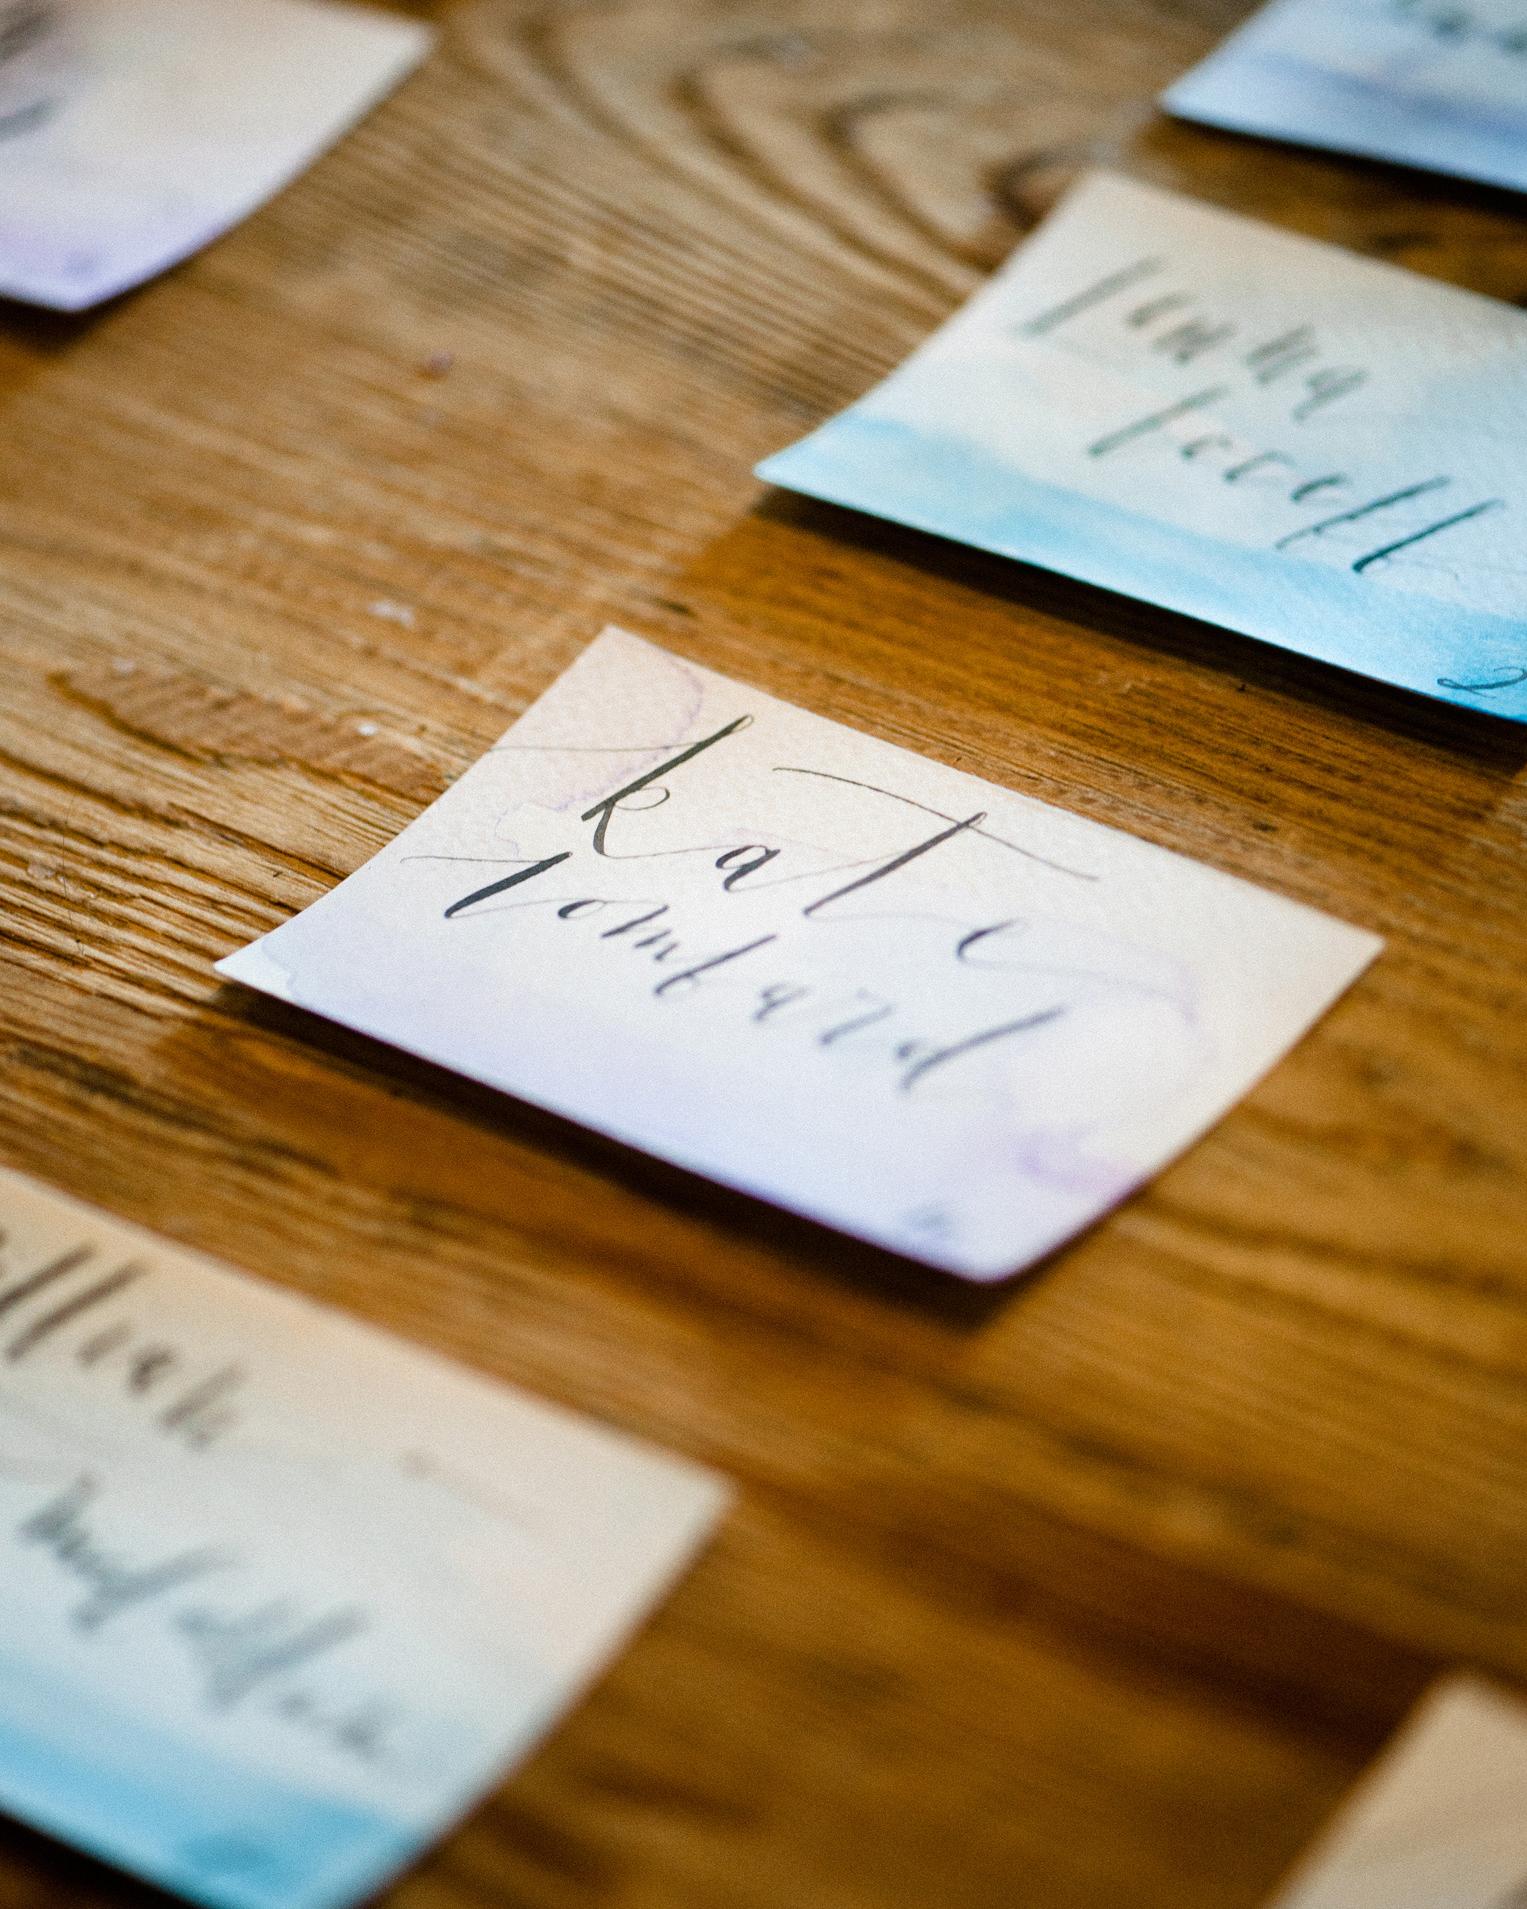 sydney-christina-wedding-escortcards-081-s111743-0115.jpg